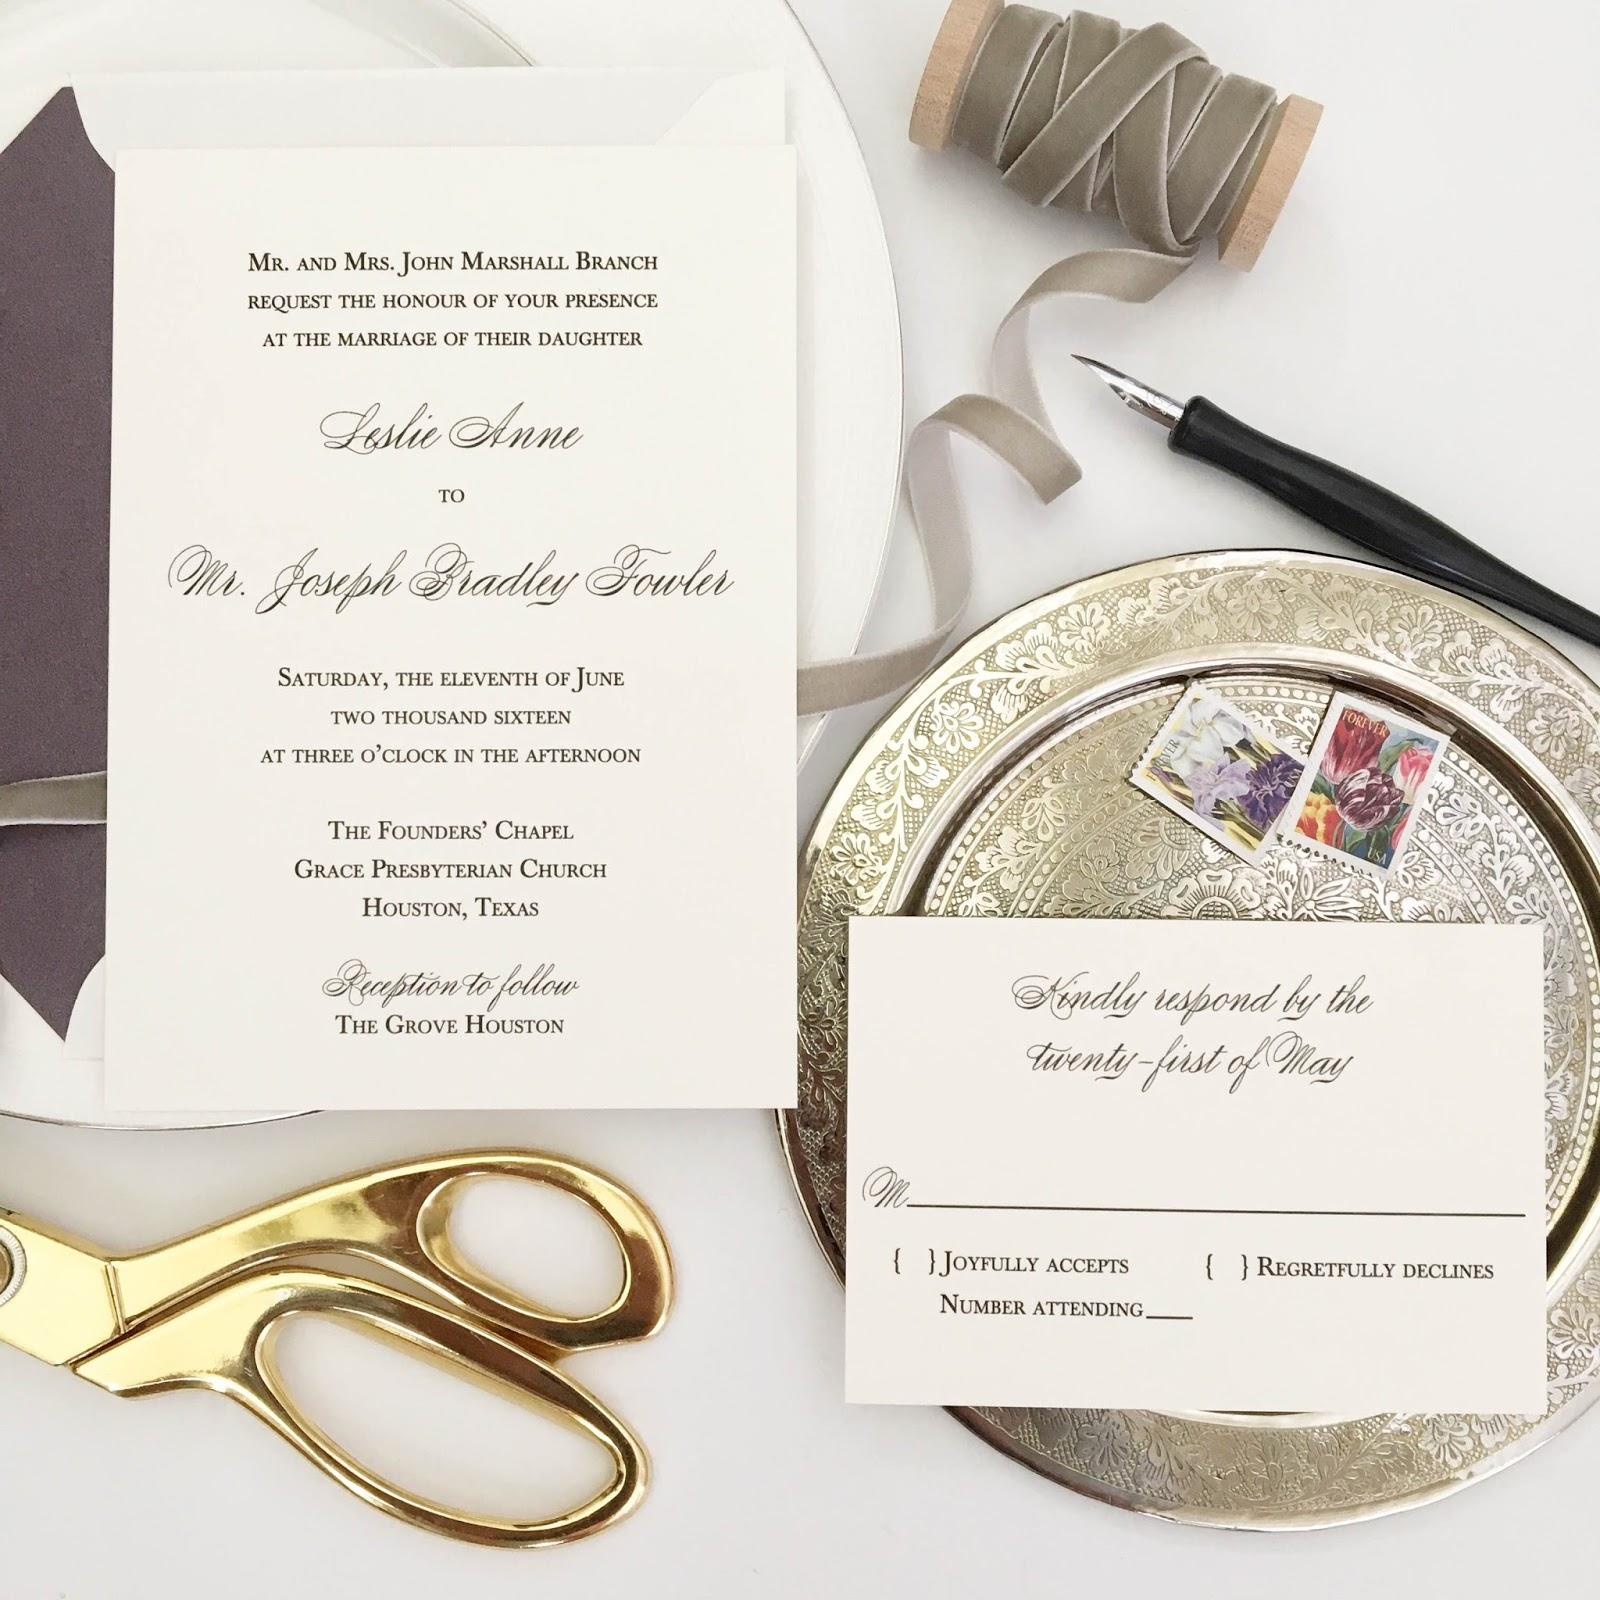 Wedding Invitations Houston: Blush Paperie: Houston Wedding Black Thermography Wedding